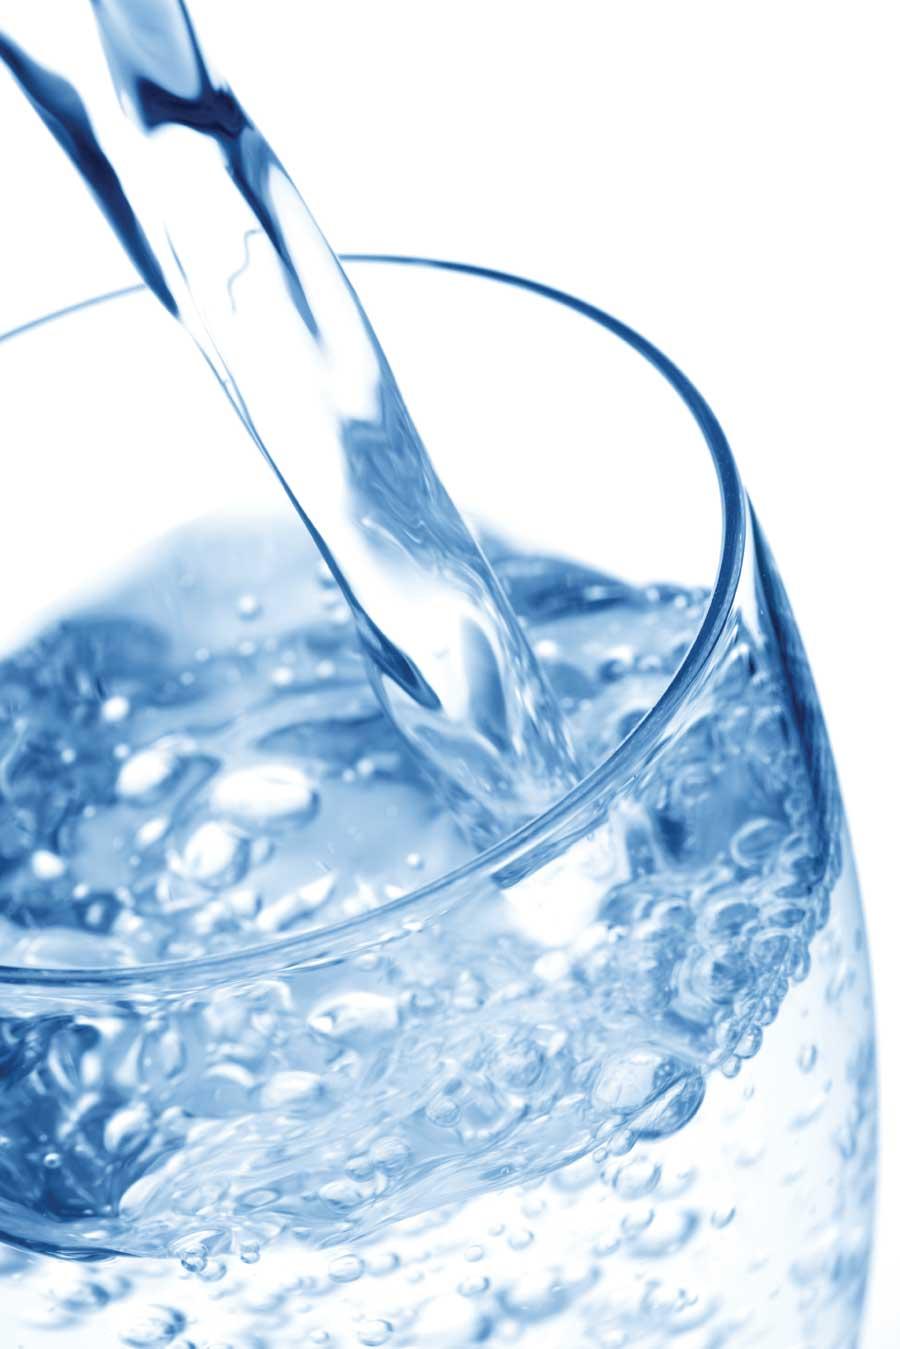 Bottiglie, filtri, rubinetto